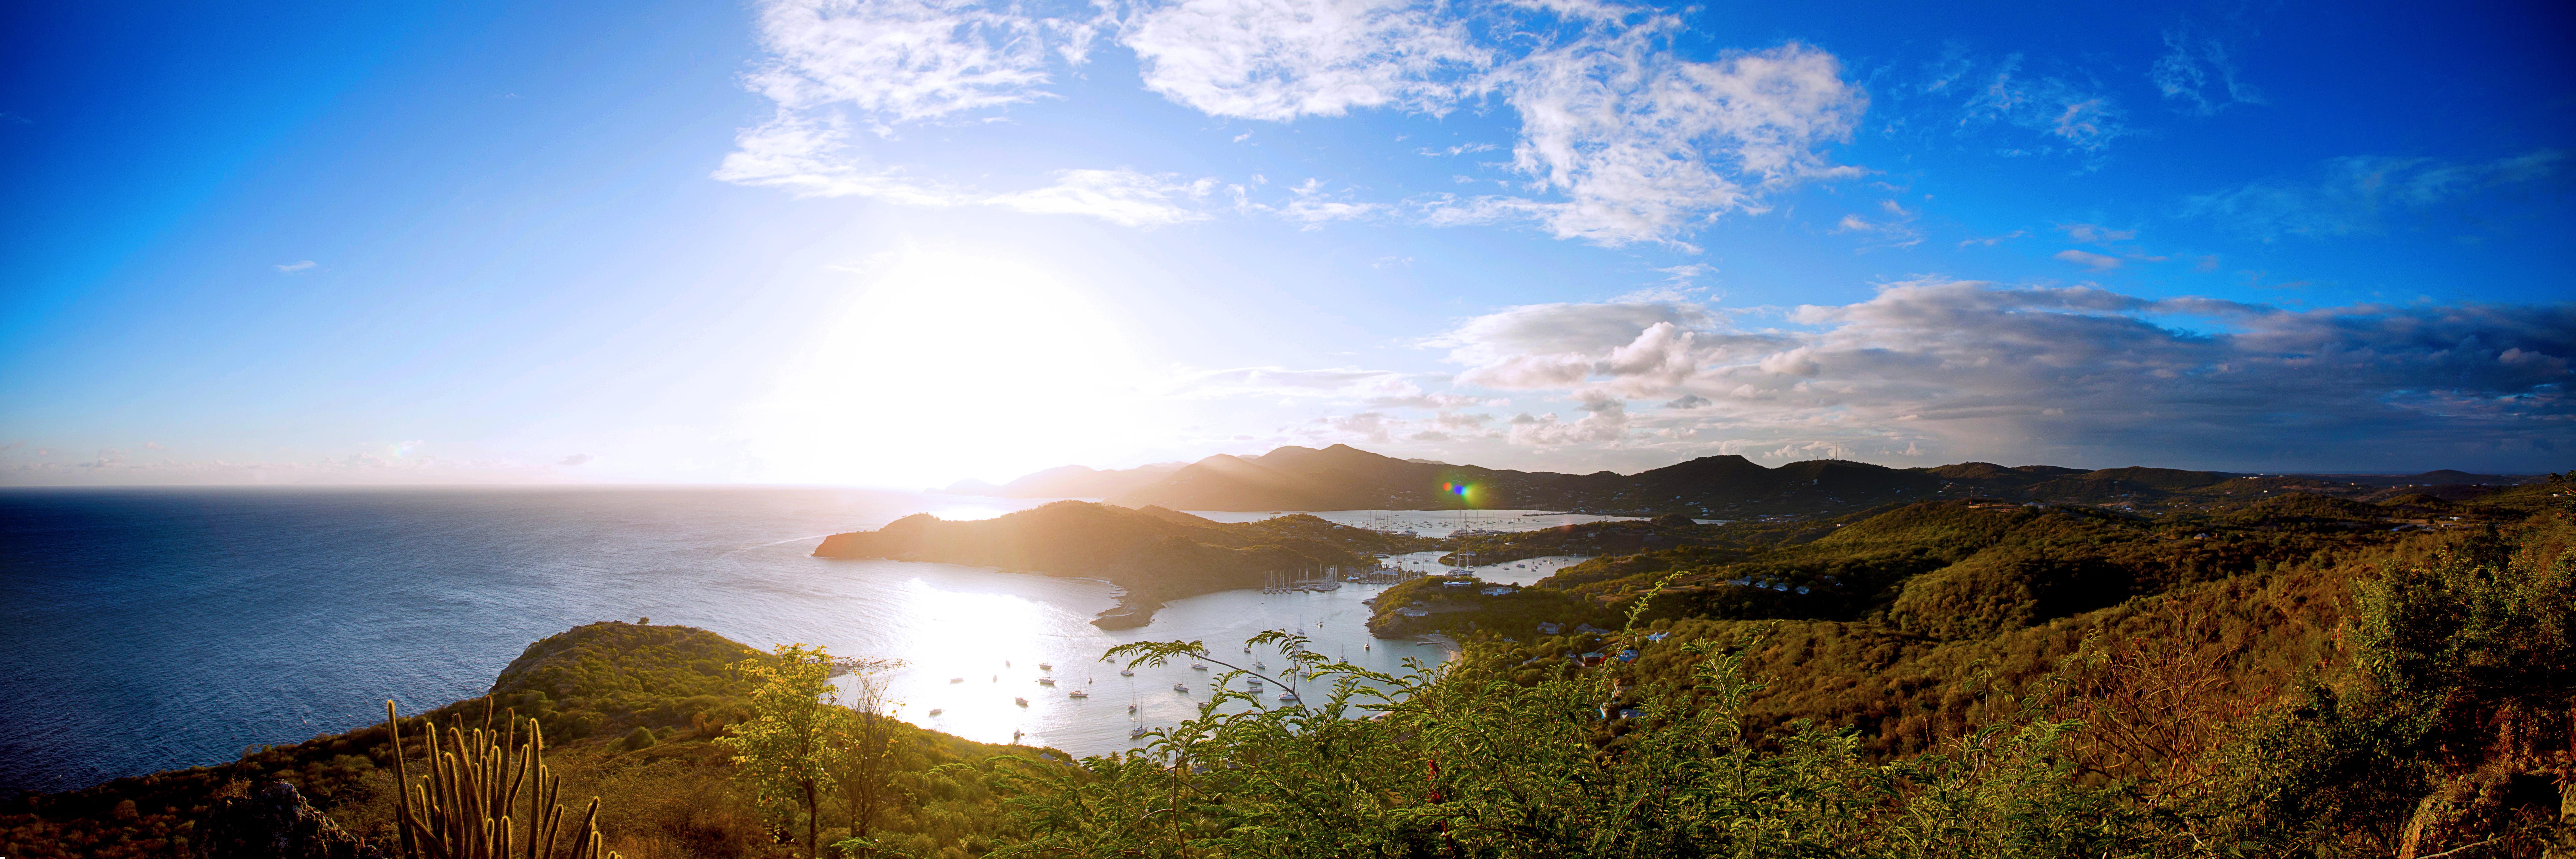 landscape panorama of Shirley Heights, Antigua.